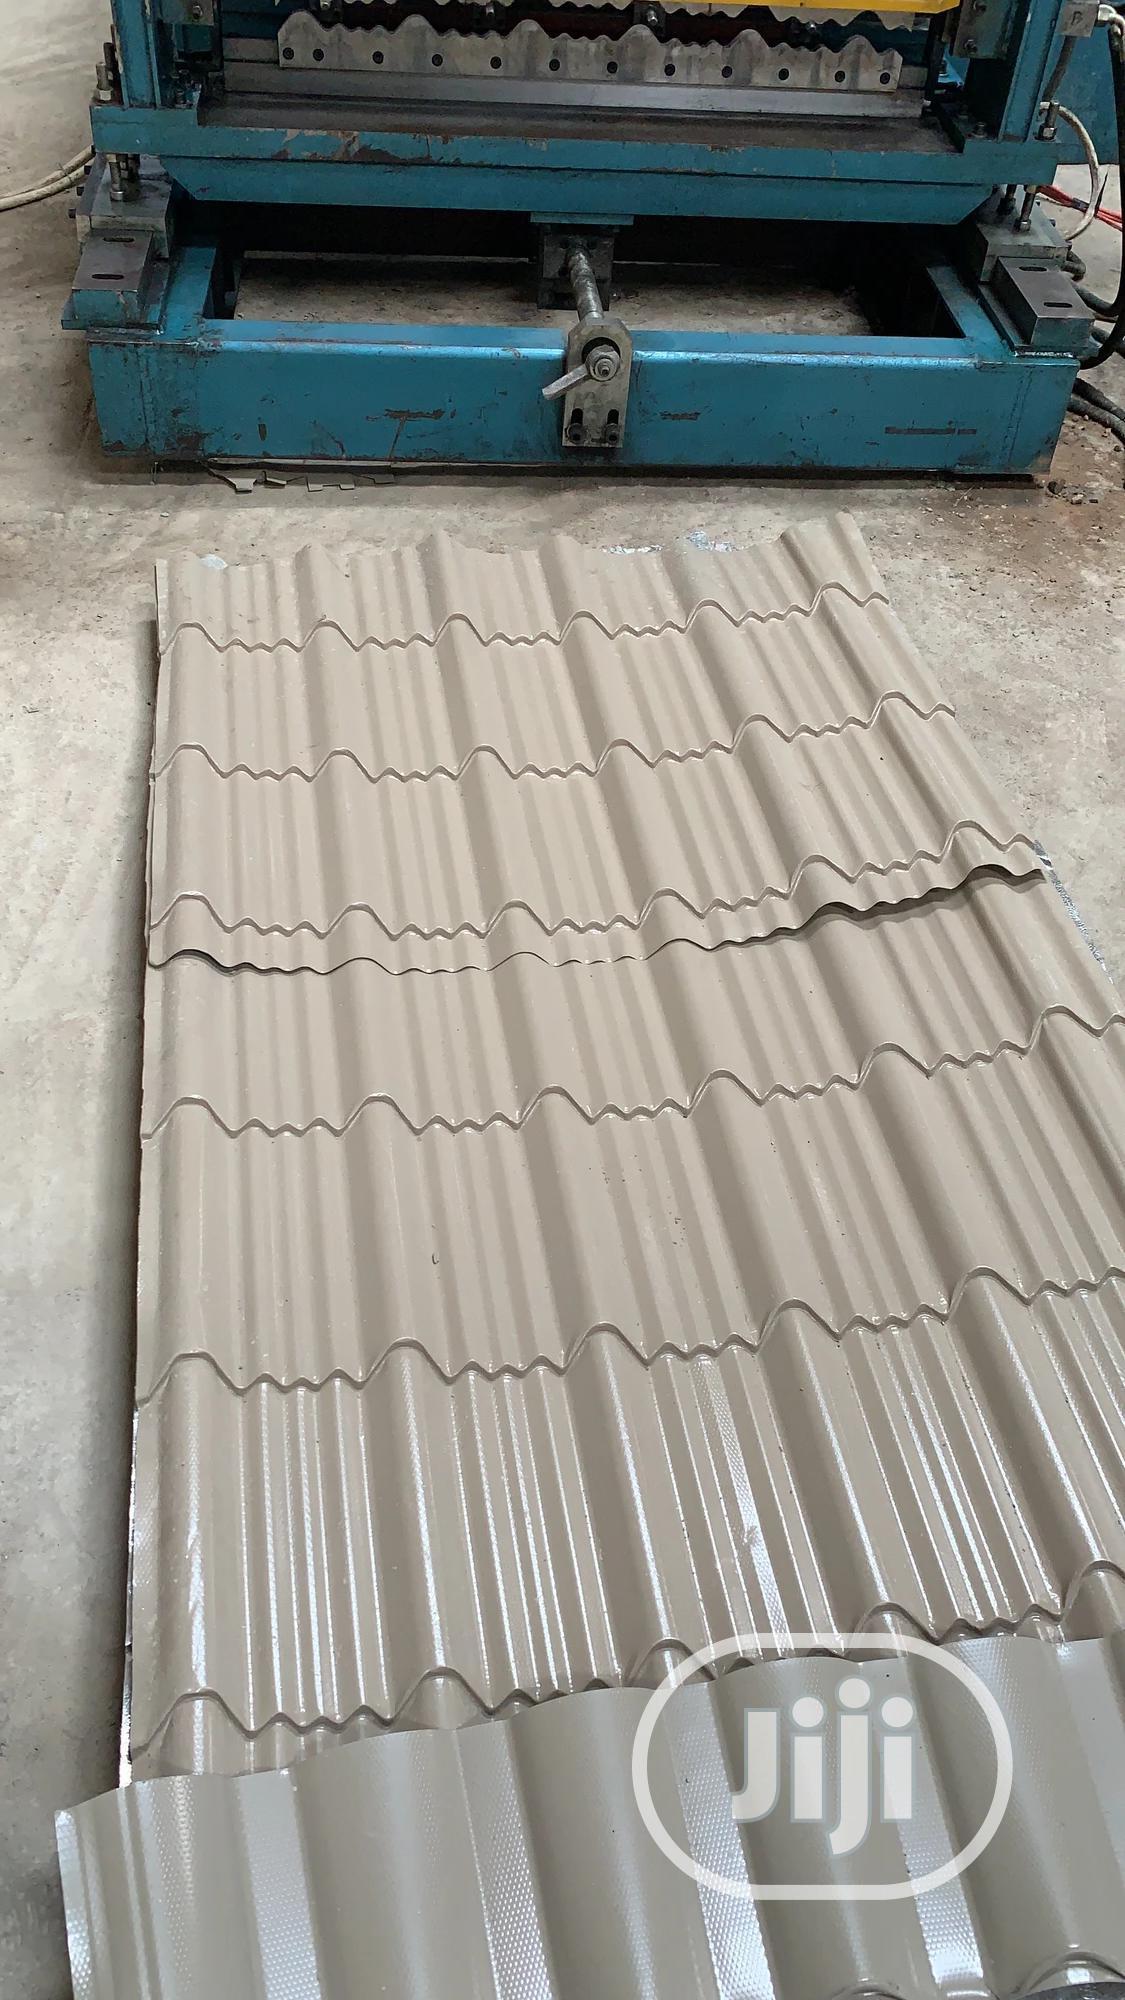 Aluminium Roofing Sheets | Building Materials for sale in Dei-Dei, Abuja (FCT) State, Nigeria